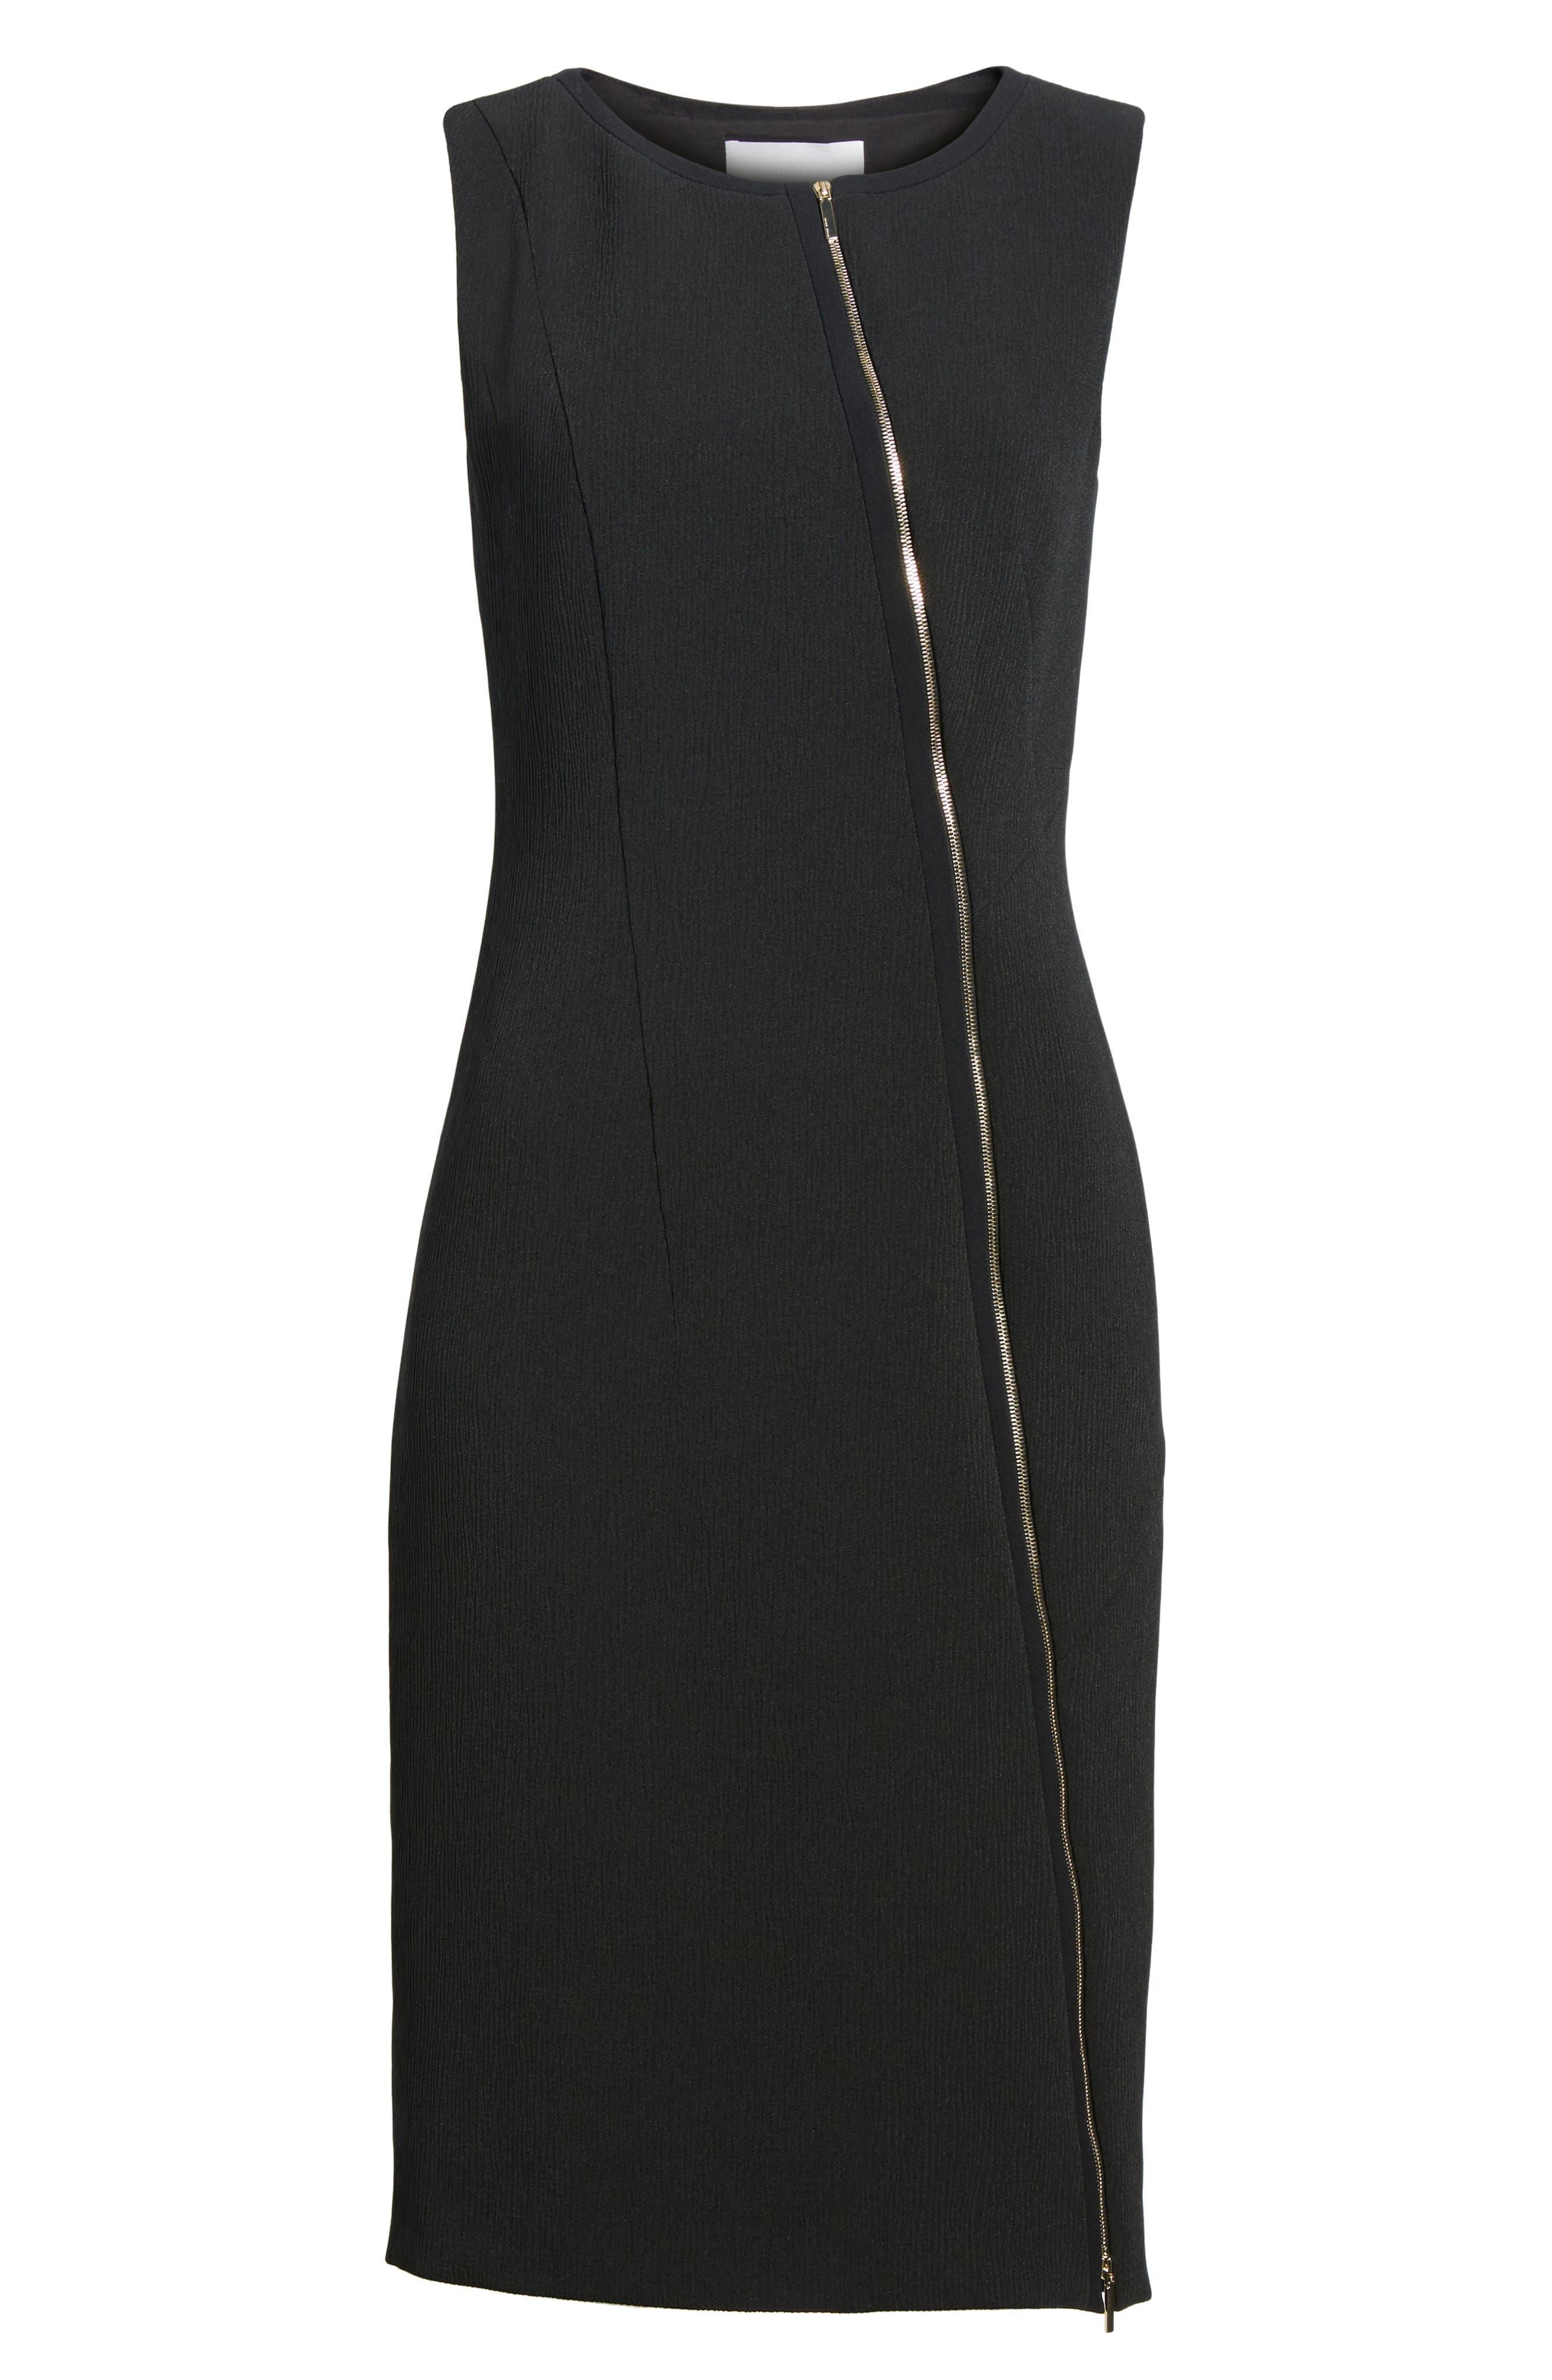 Danafea Dress,                             Alternate thumbnail 6, color,                             001